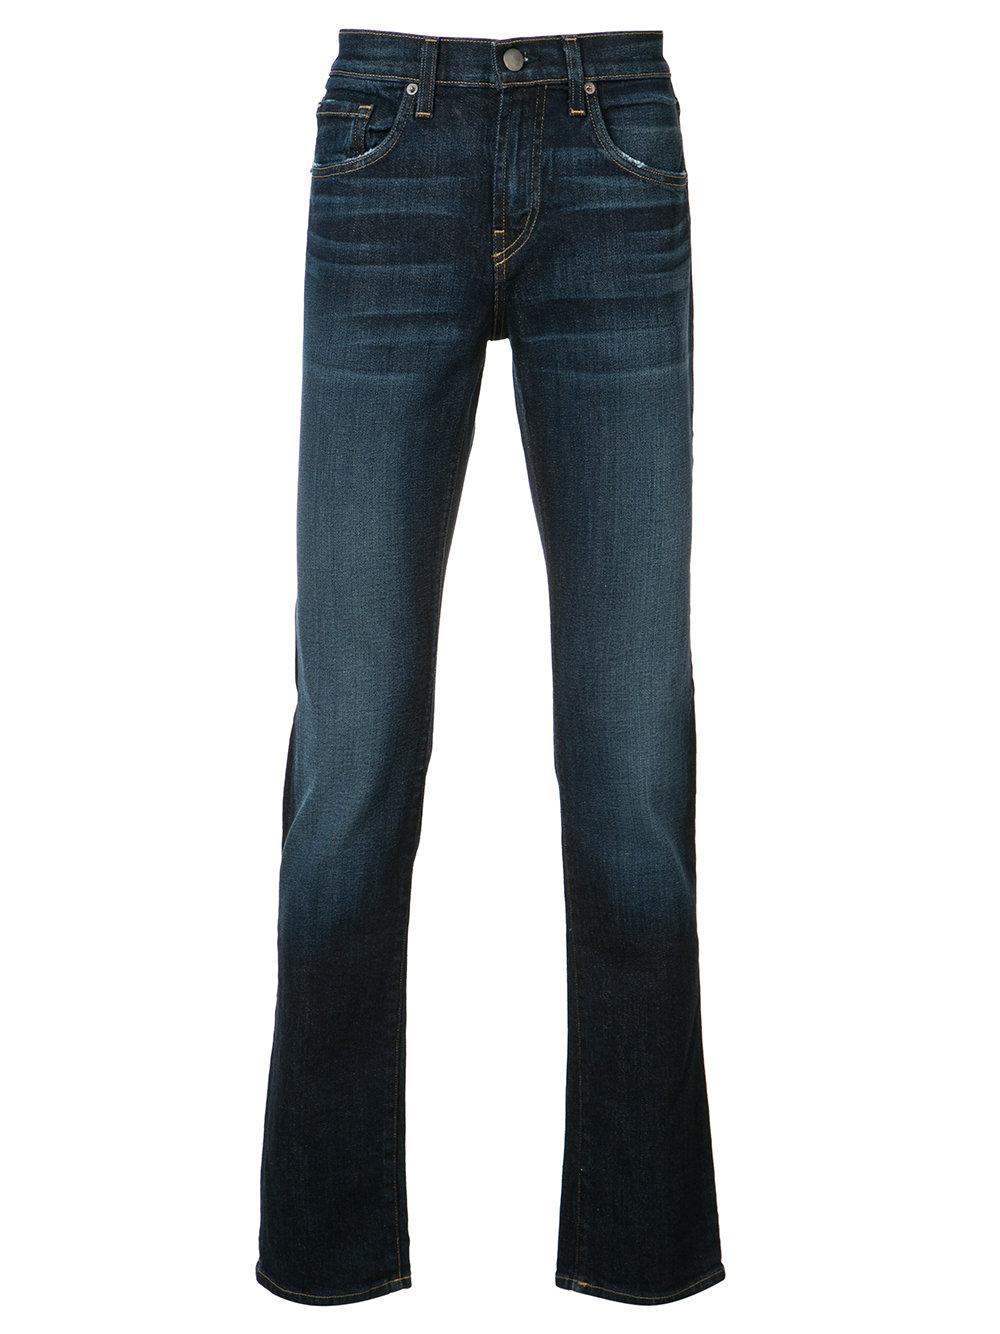 J brand Five Pockets Skinny Jeans in Blue for Men